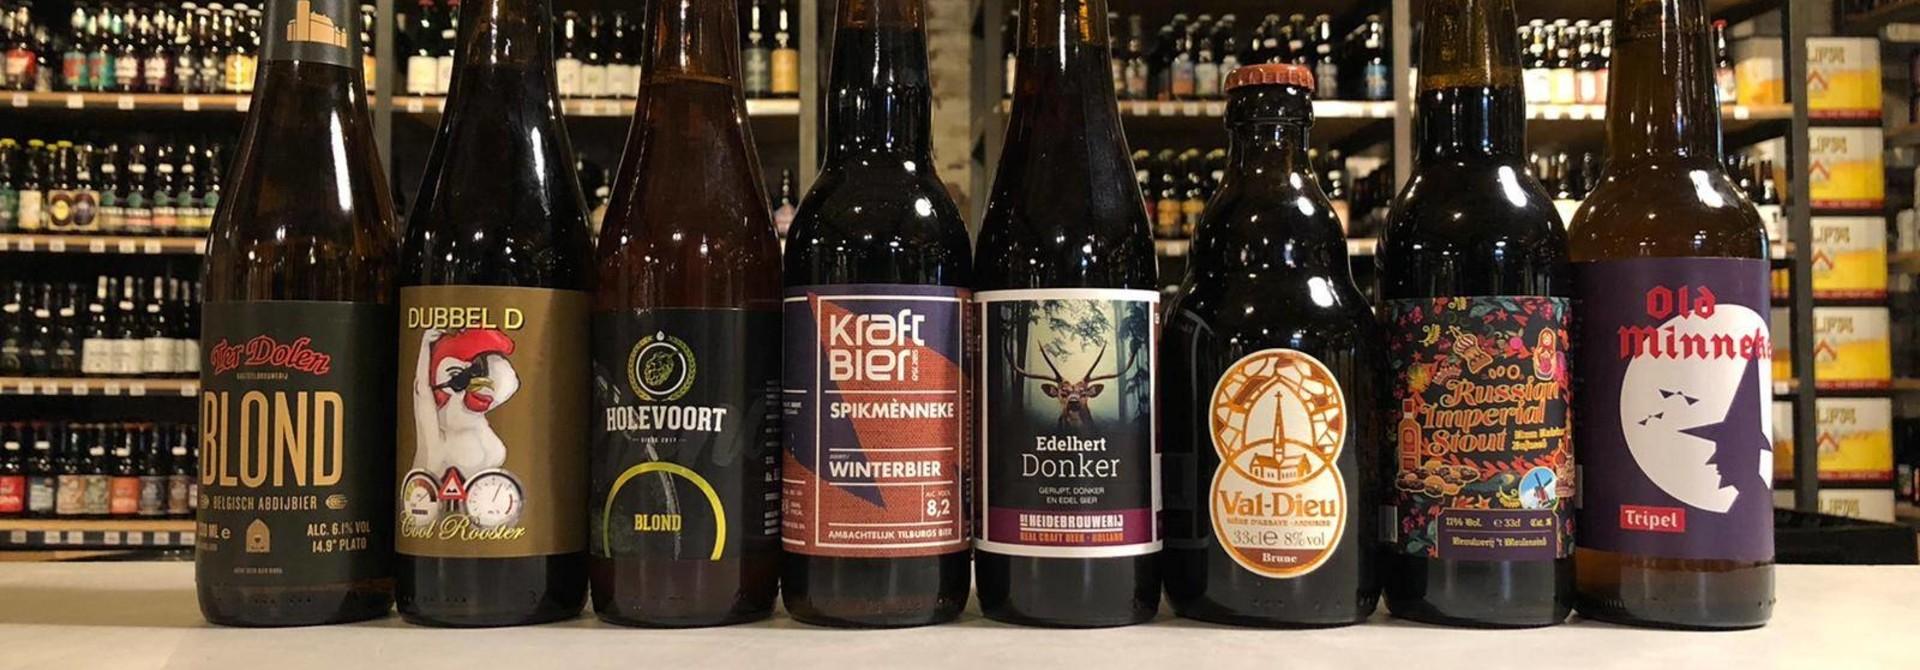 Speciaalbier – bierpakket januari 2021